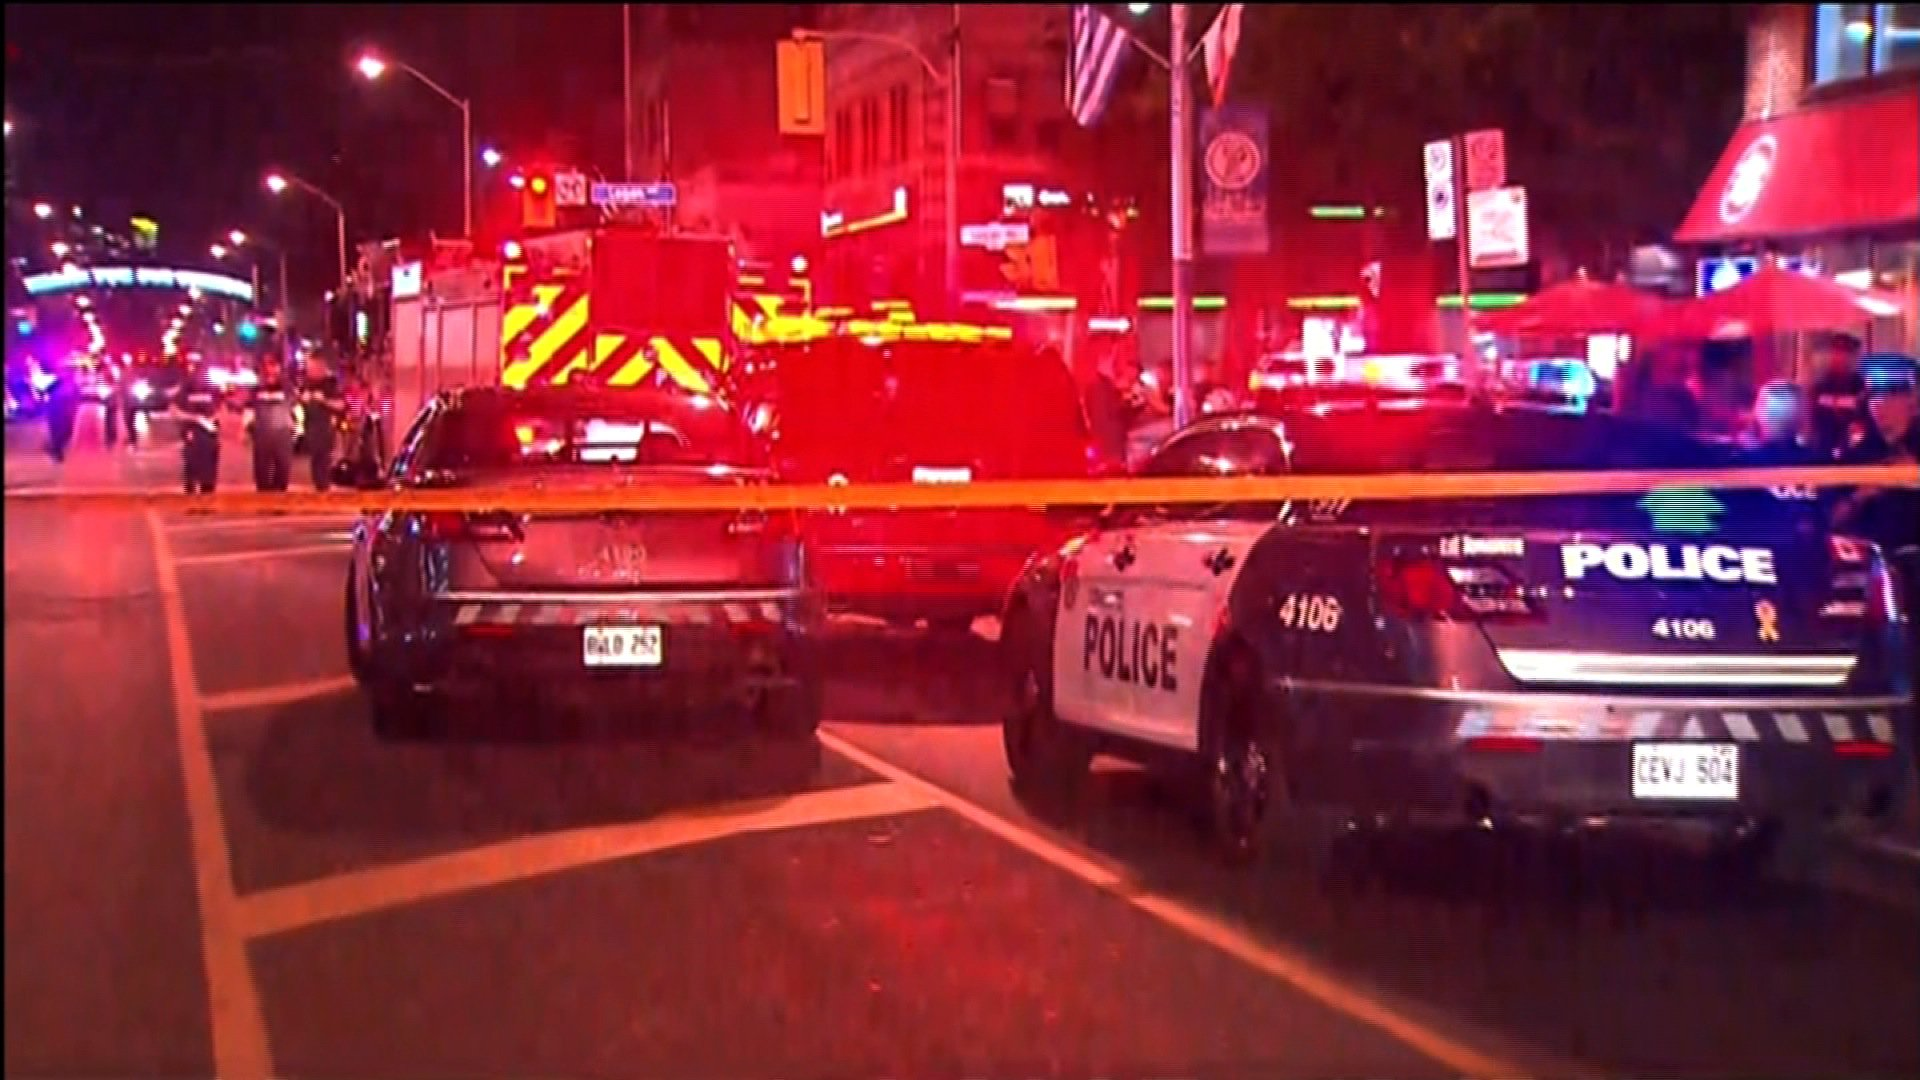 ÚLTIMA HORA Tiroteo en Toronto: varias personas están heridas  https://t.co/VcqmRgUmjp https://t.co/JopfMDp7ur